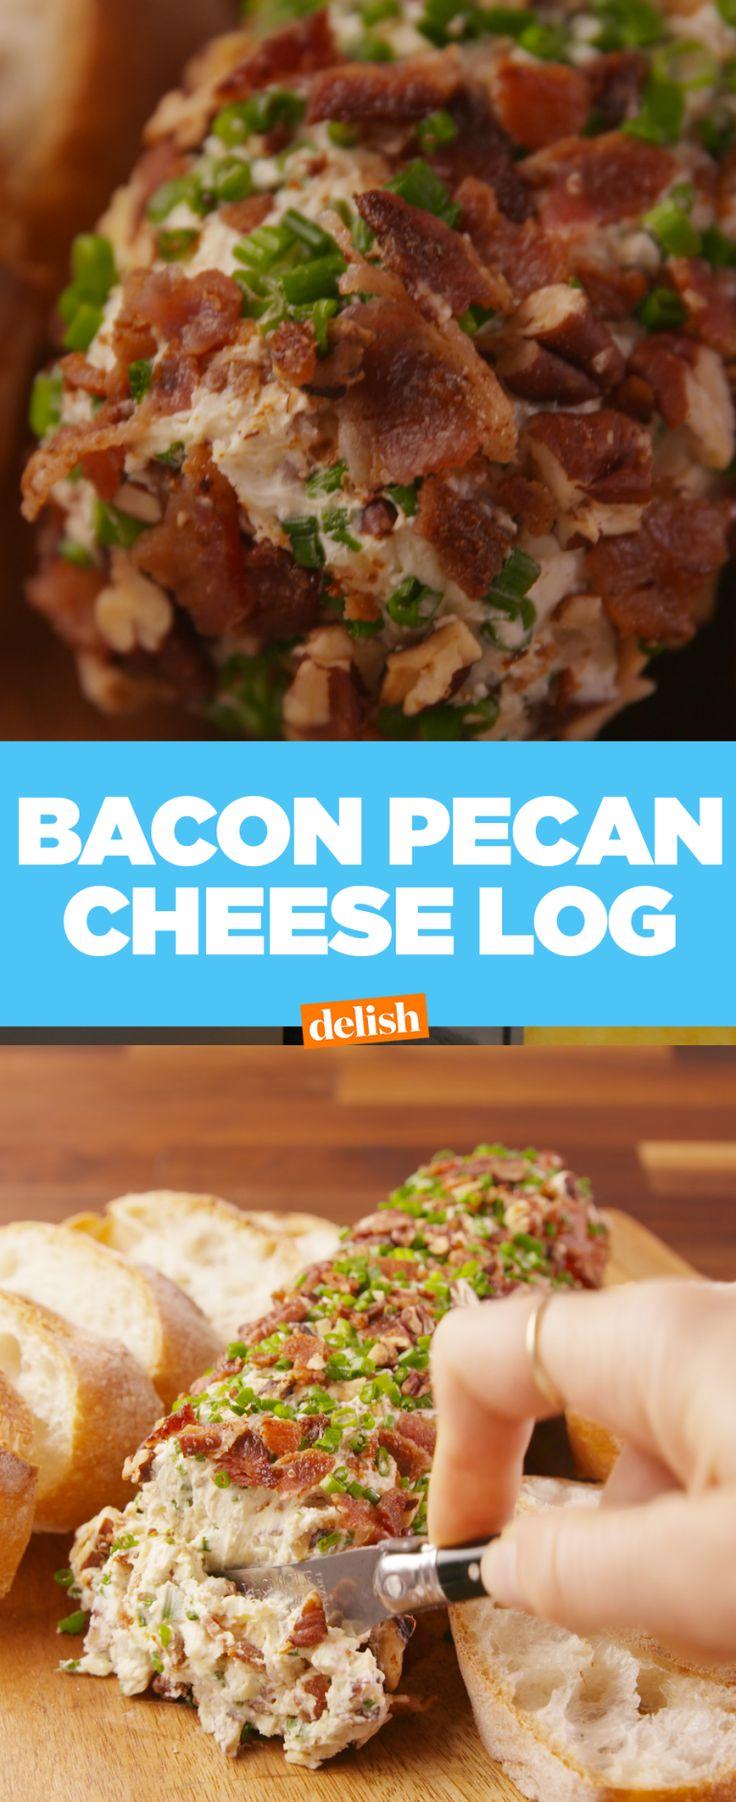 Bacon Pecan Cheese Log  - Delish.com